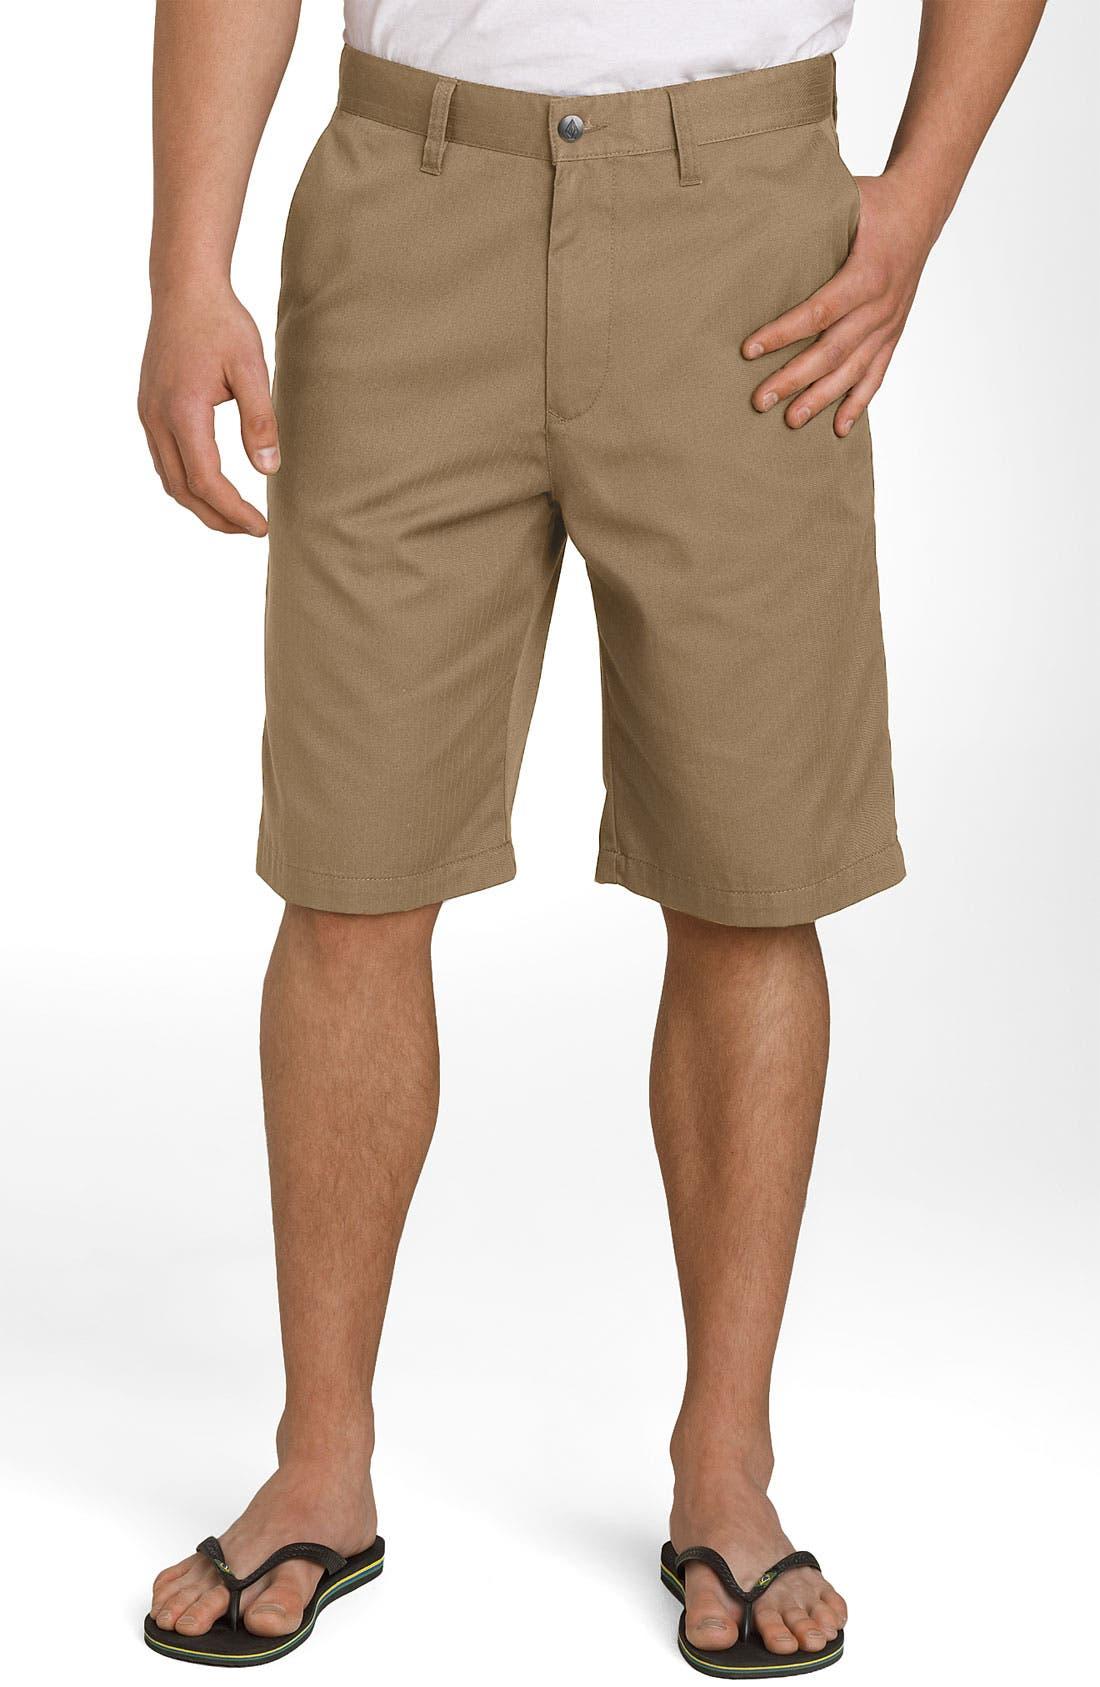 Alternate Image 1 Selected - Volcom Chino Shorts